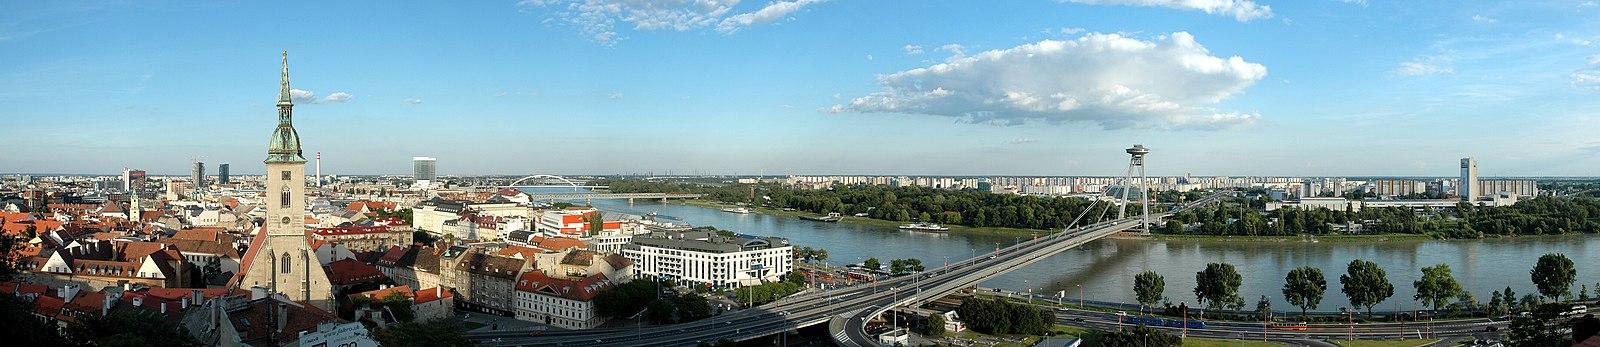 Bratislava Panorama 01.jpg